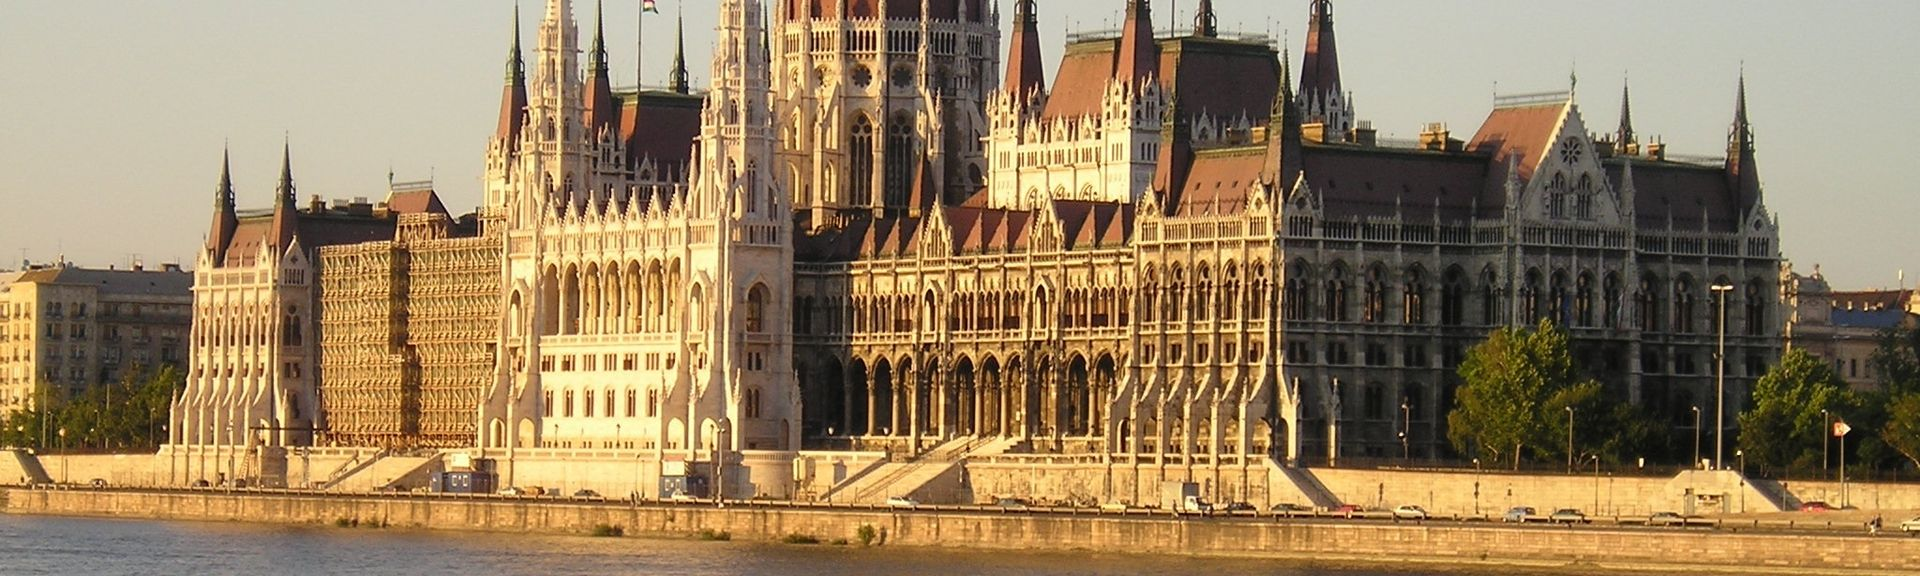 District IX, Budapest, Hungary